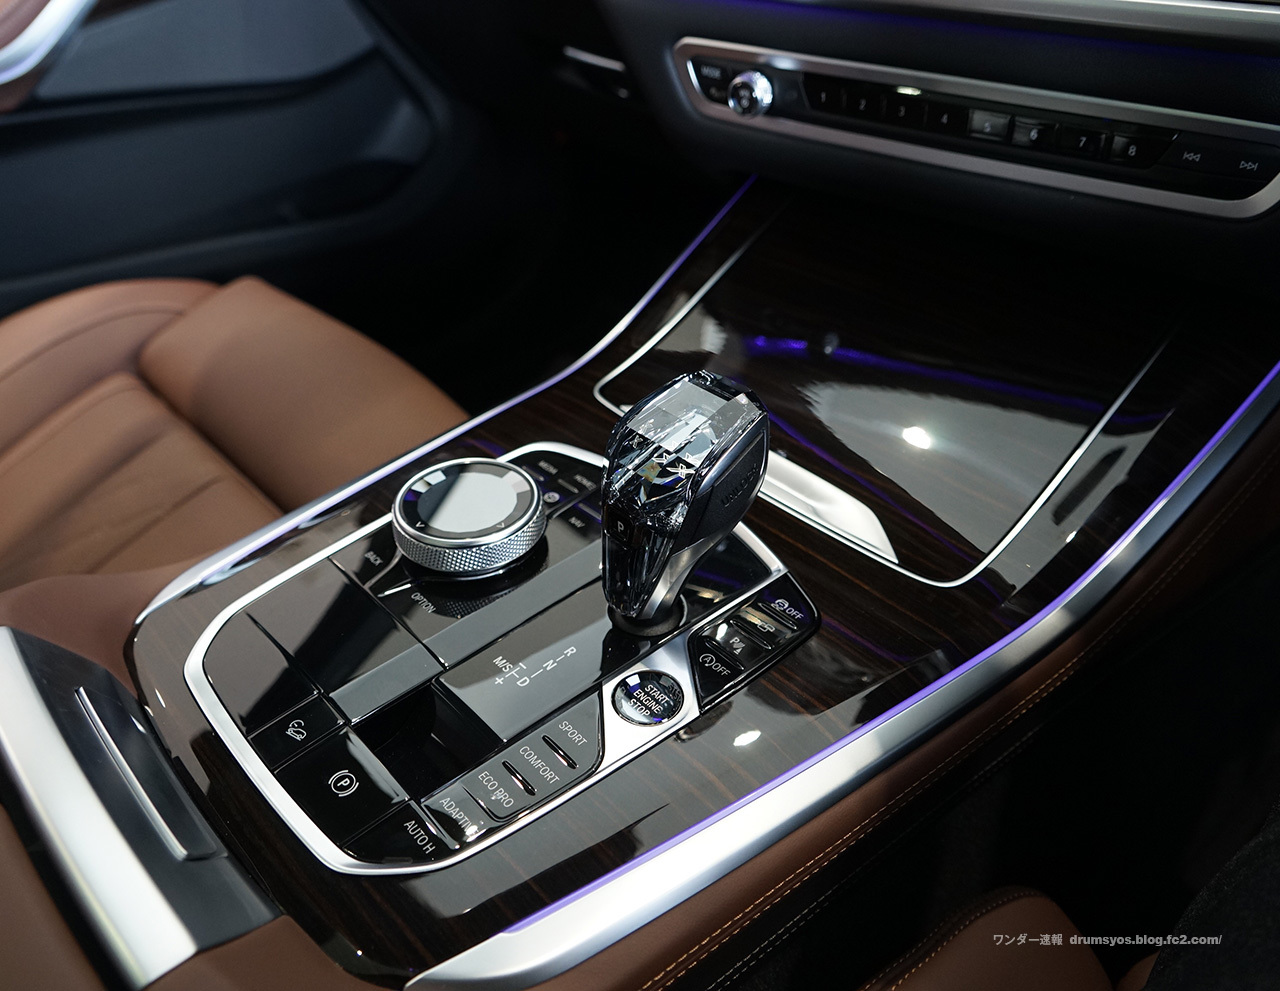 BMWX5_05_20190426184149f65.jpg